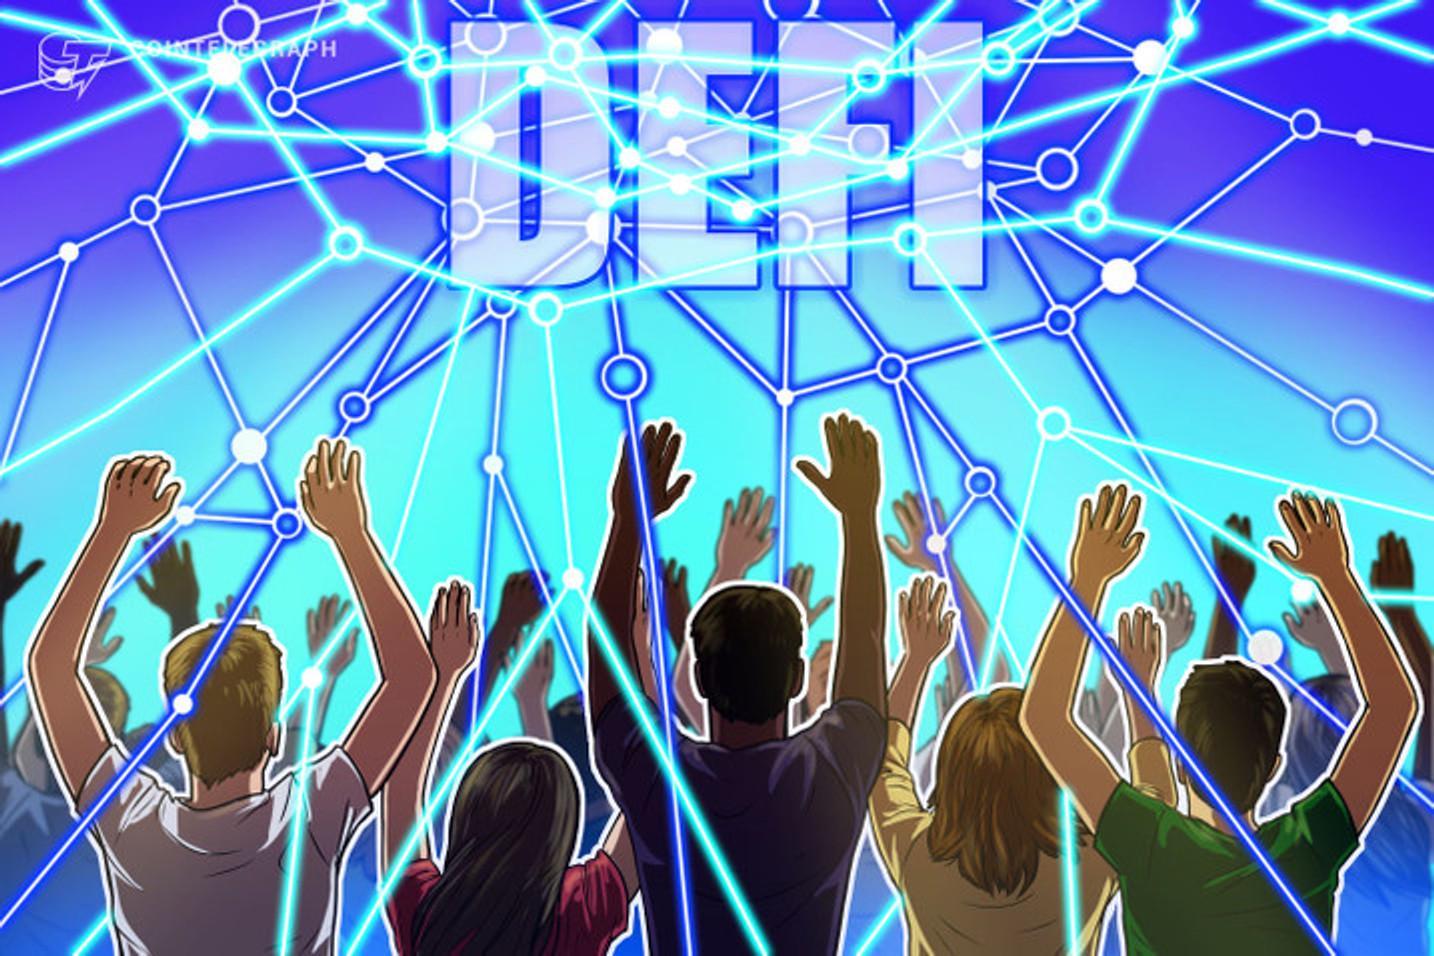 La plataforma Mexo agregó tokens DeFI para operar